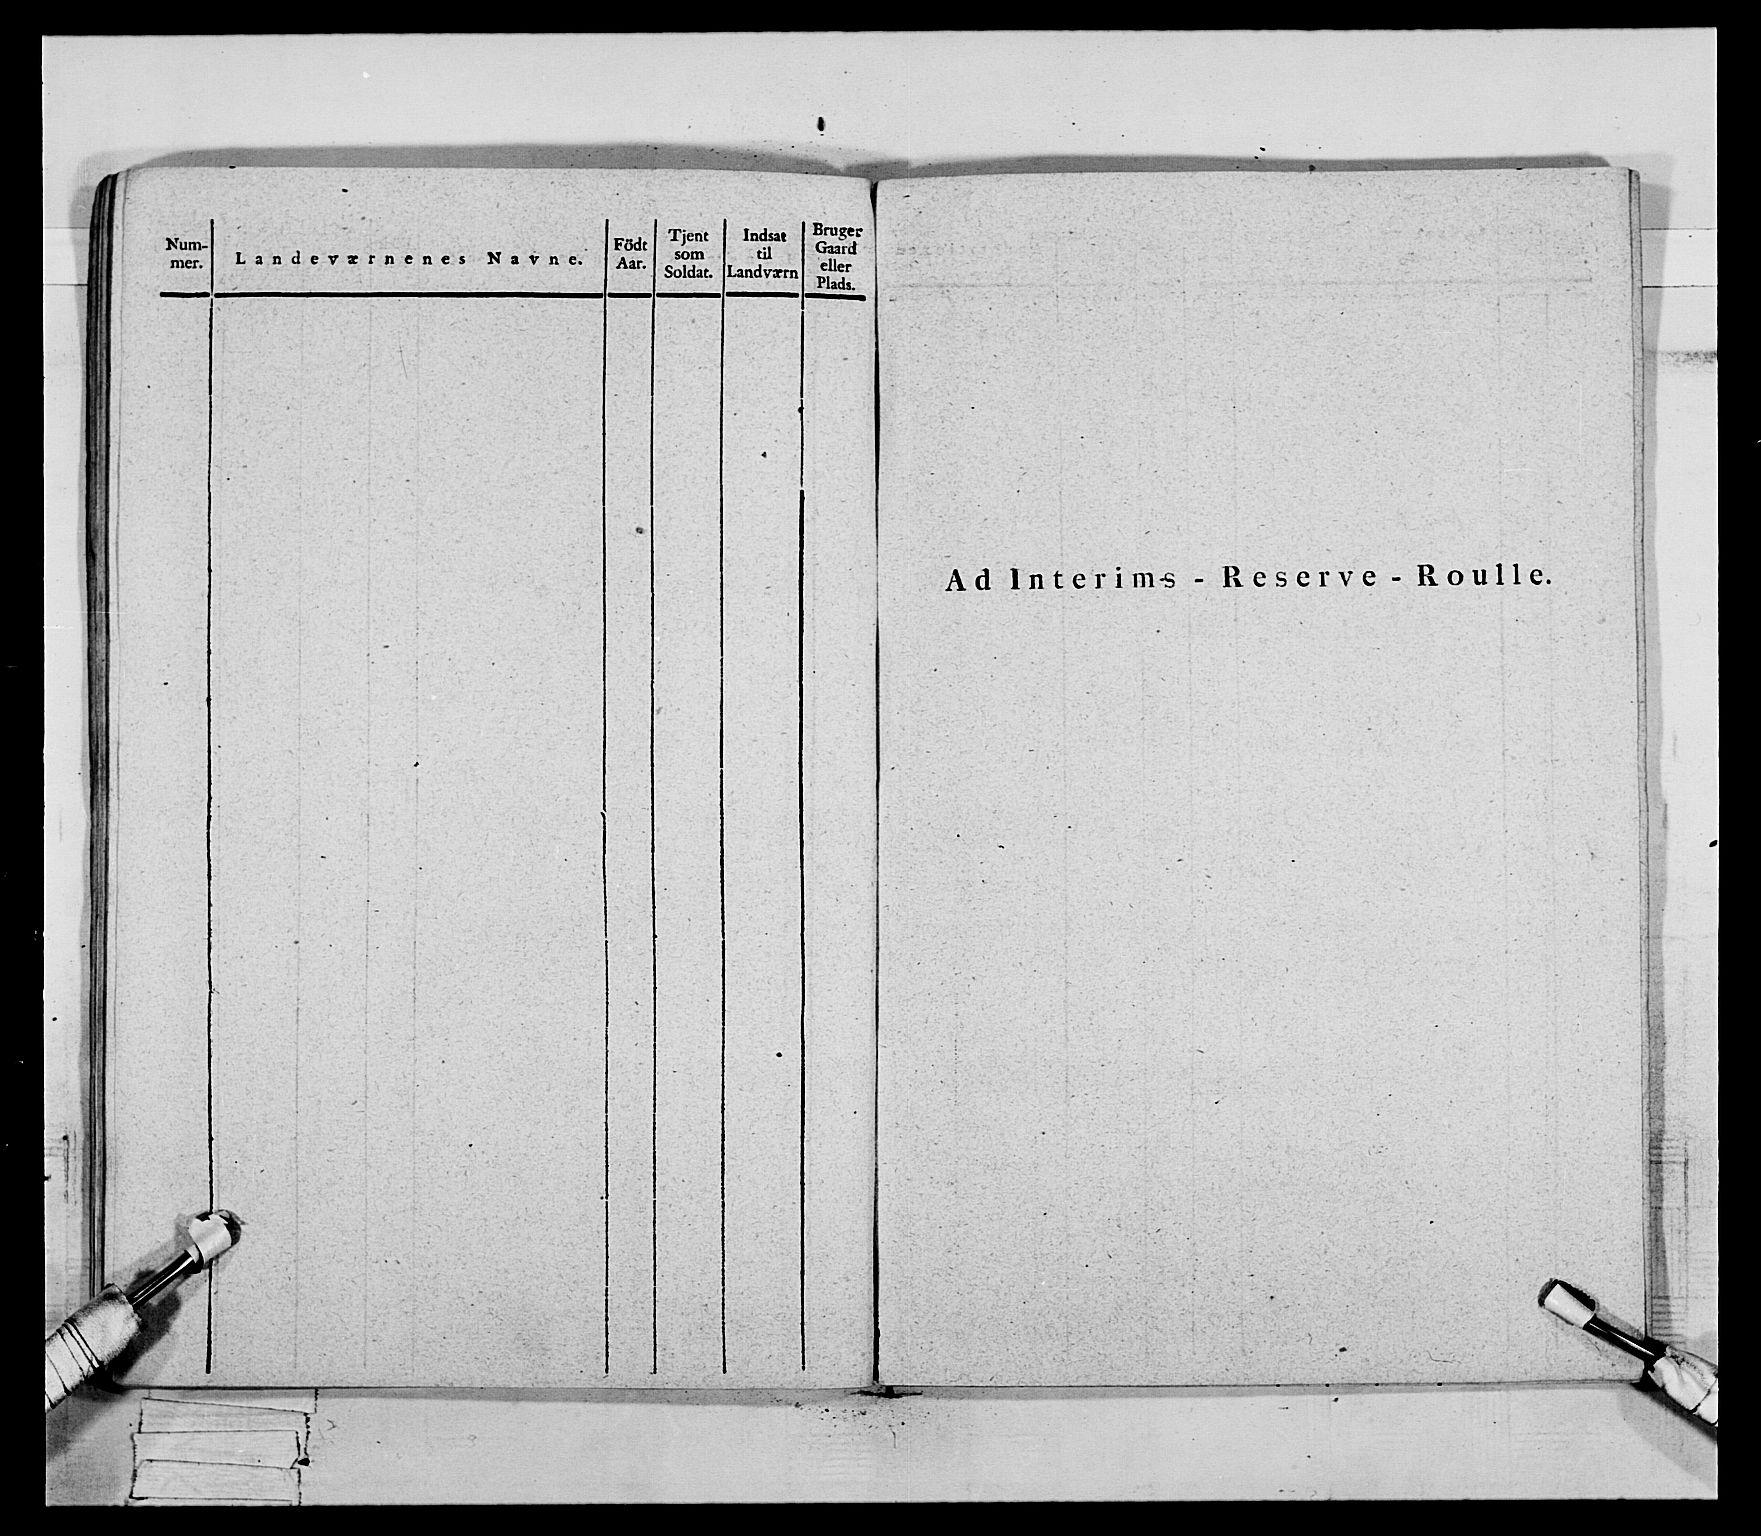 RA, Generalitets- og kommissariatskollegiet, Det kongelige norske kommissariatskollegium, E/Eh/L0069: Opplandske gevorbne infanteriregiment, 1810-1818, p. 697